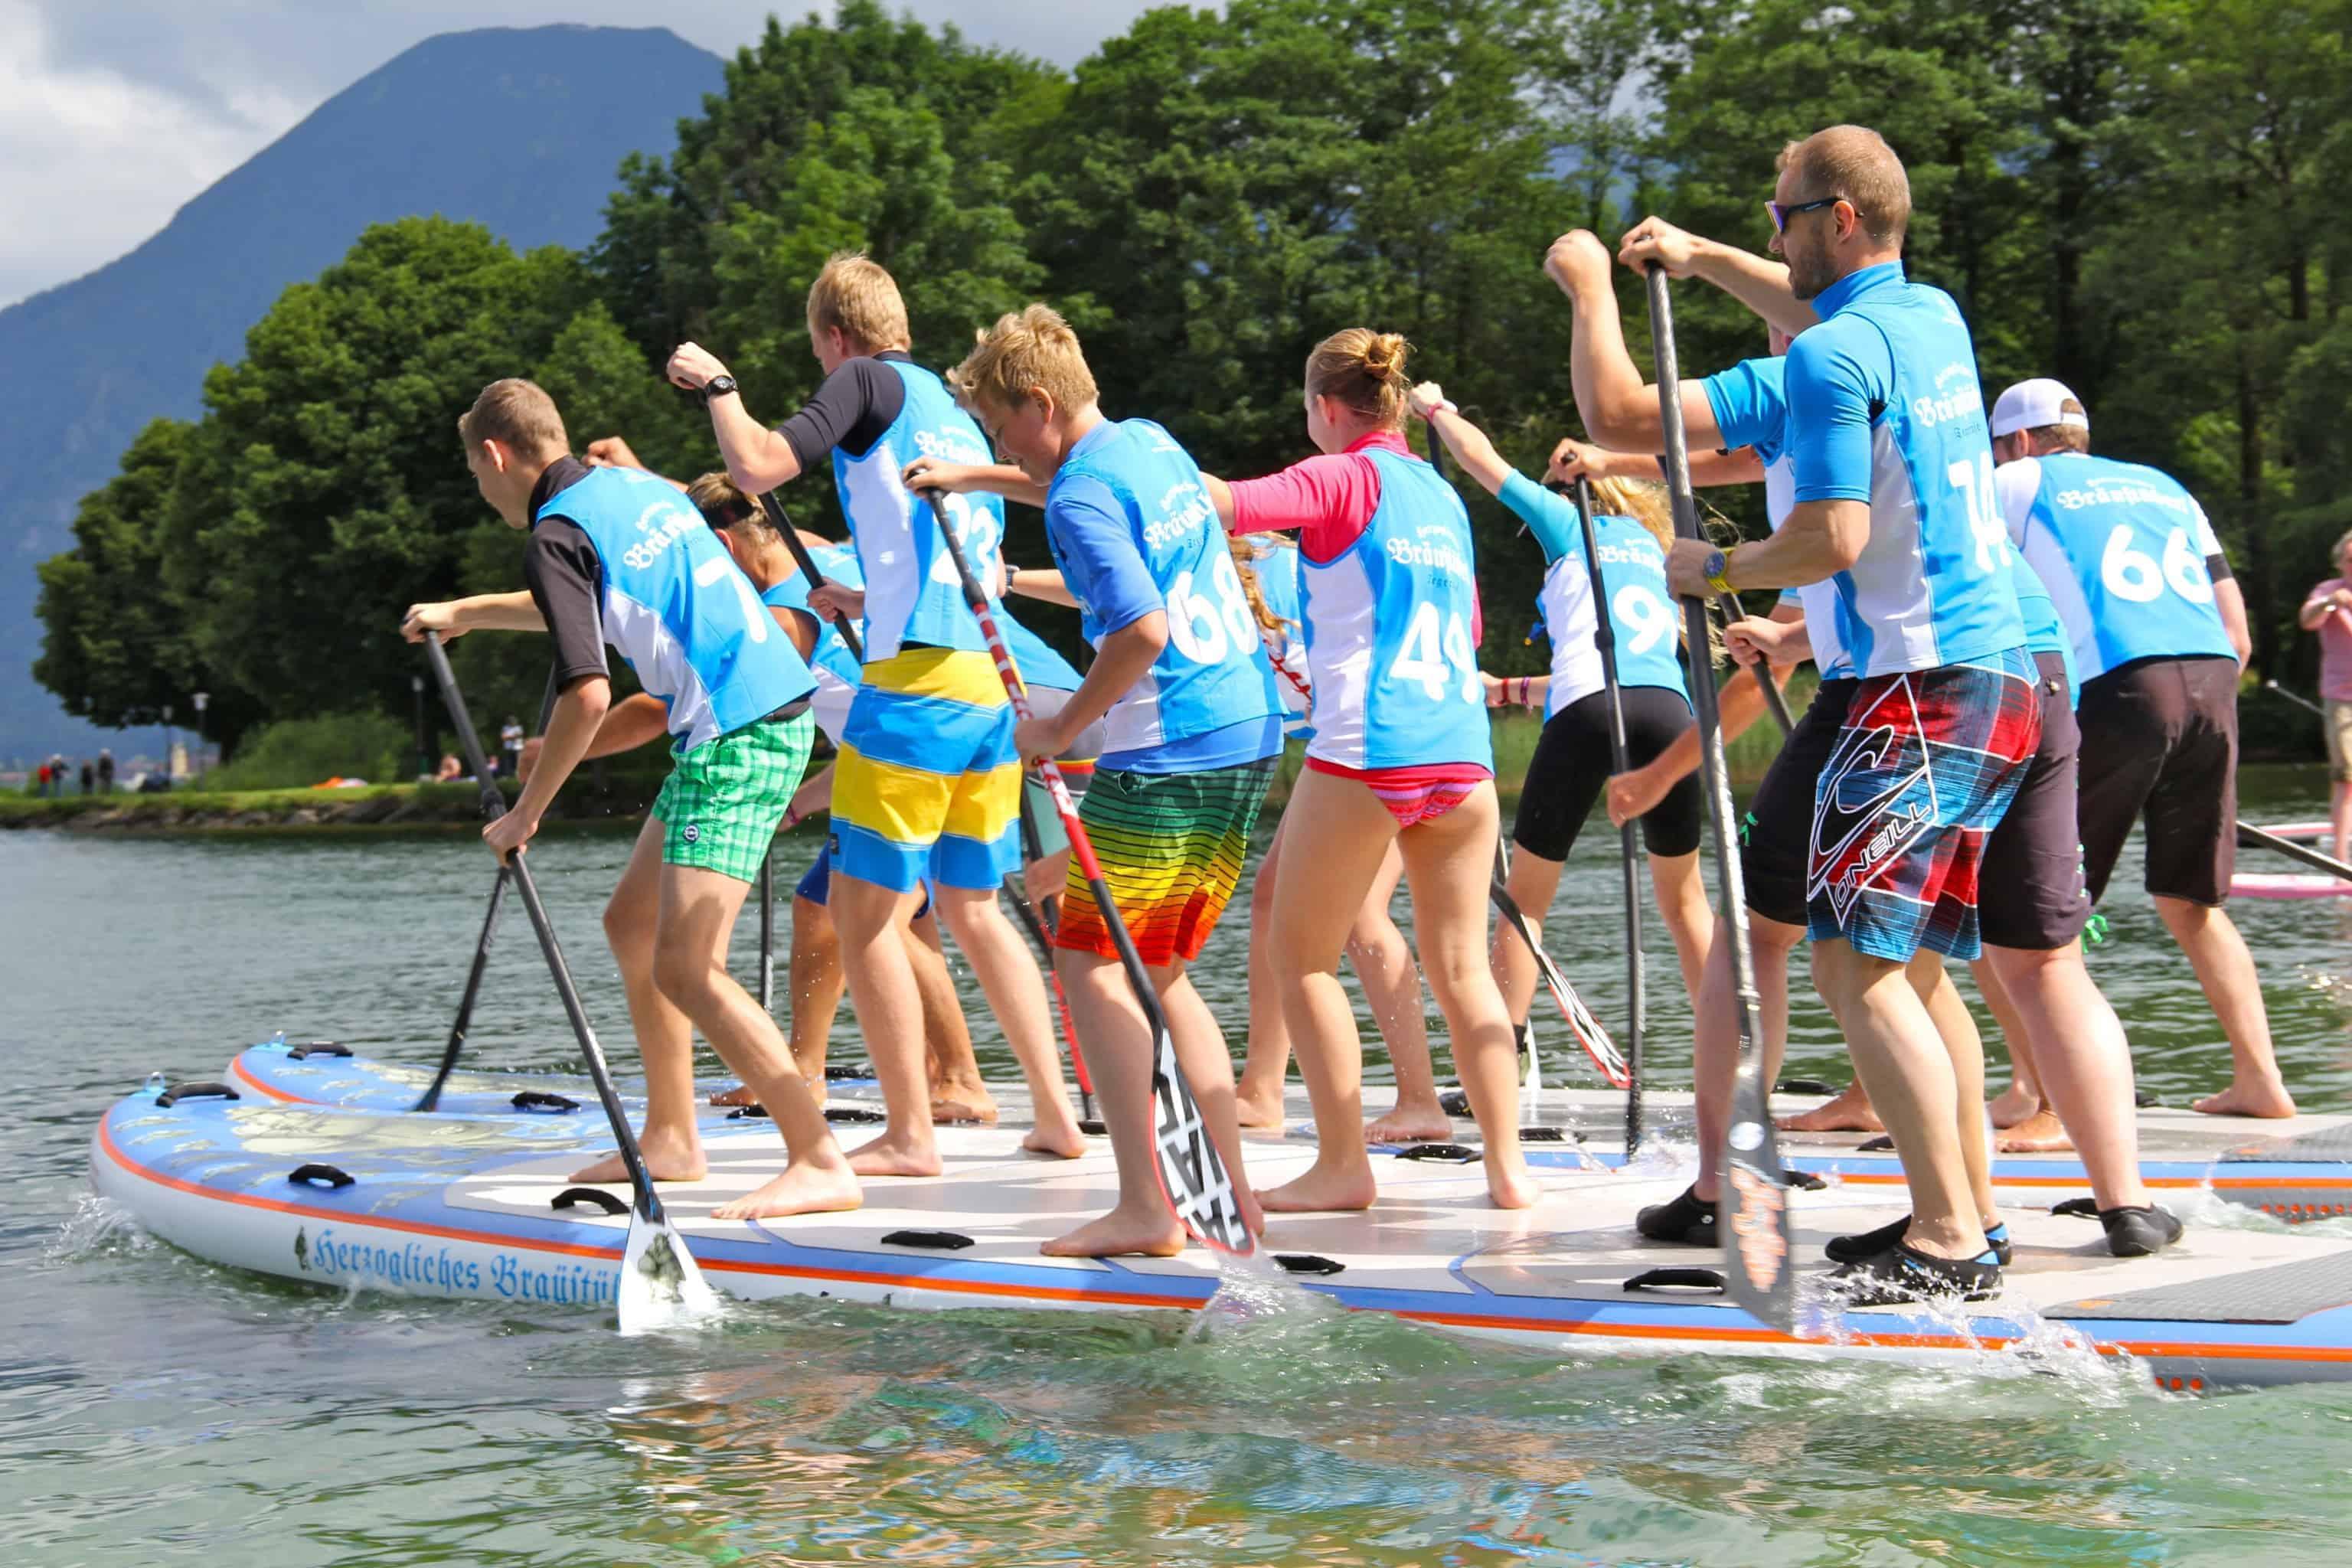 Fräscha Stand-Up-Paddling Team-Events - Sailingcenter Tegernsee TW-88